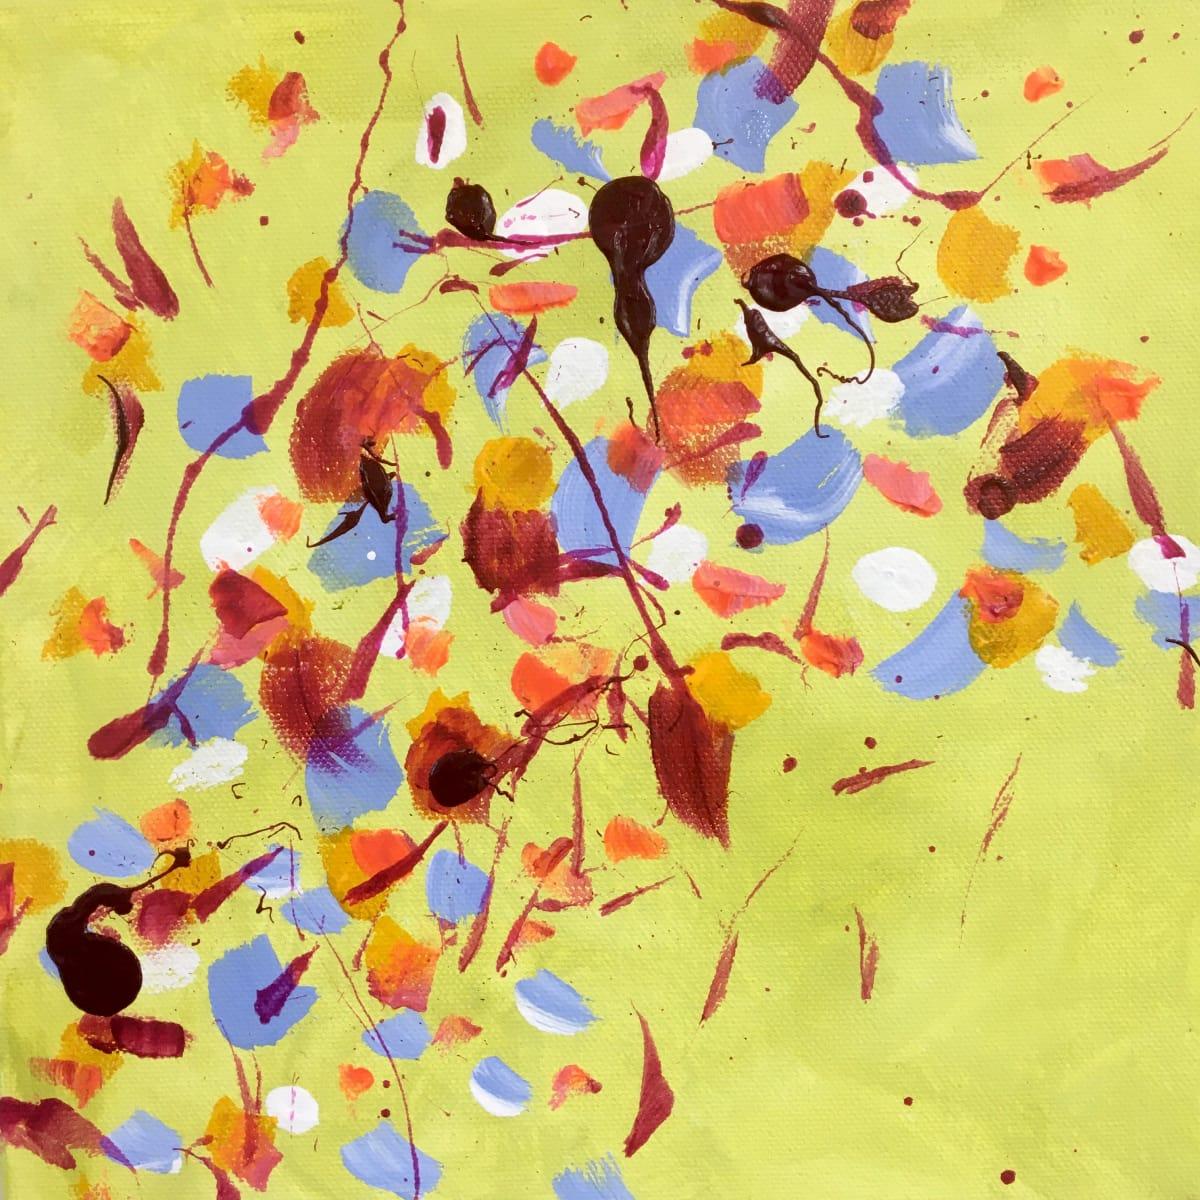 Autumn Breeze no.3 by Julea Boswell